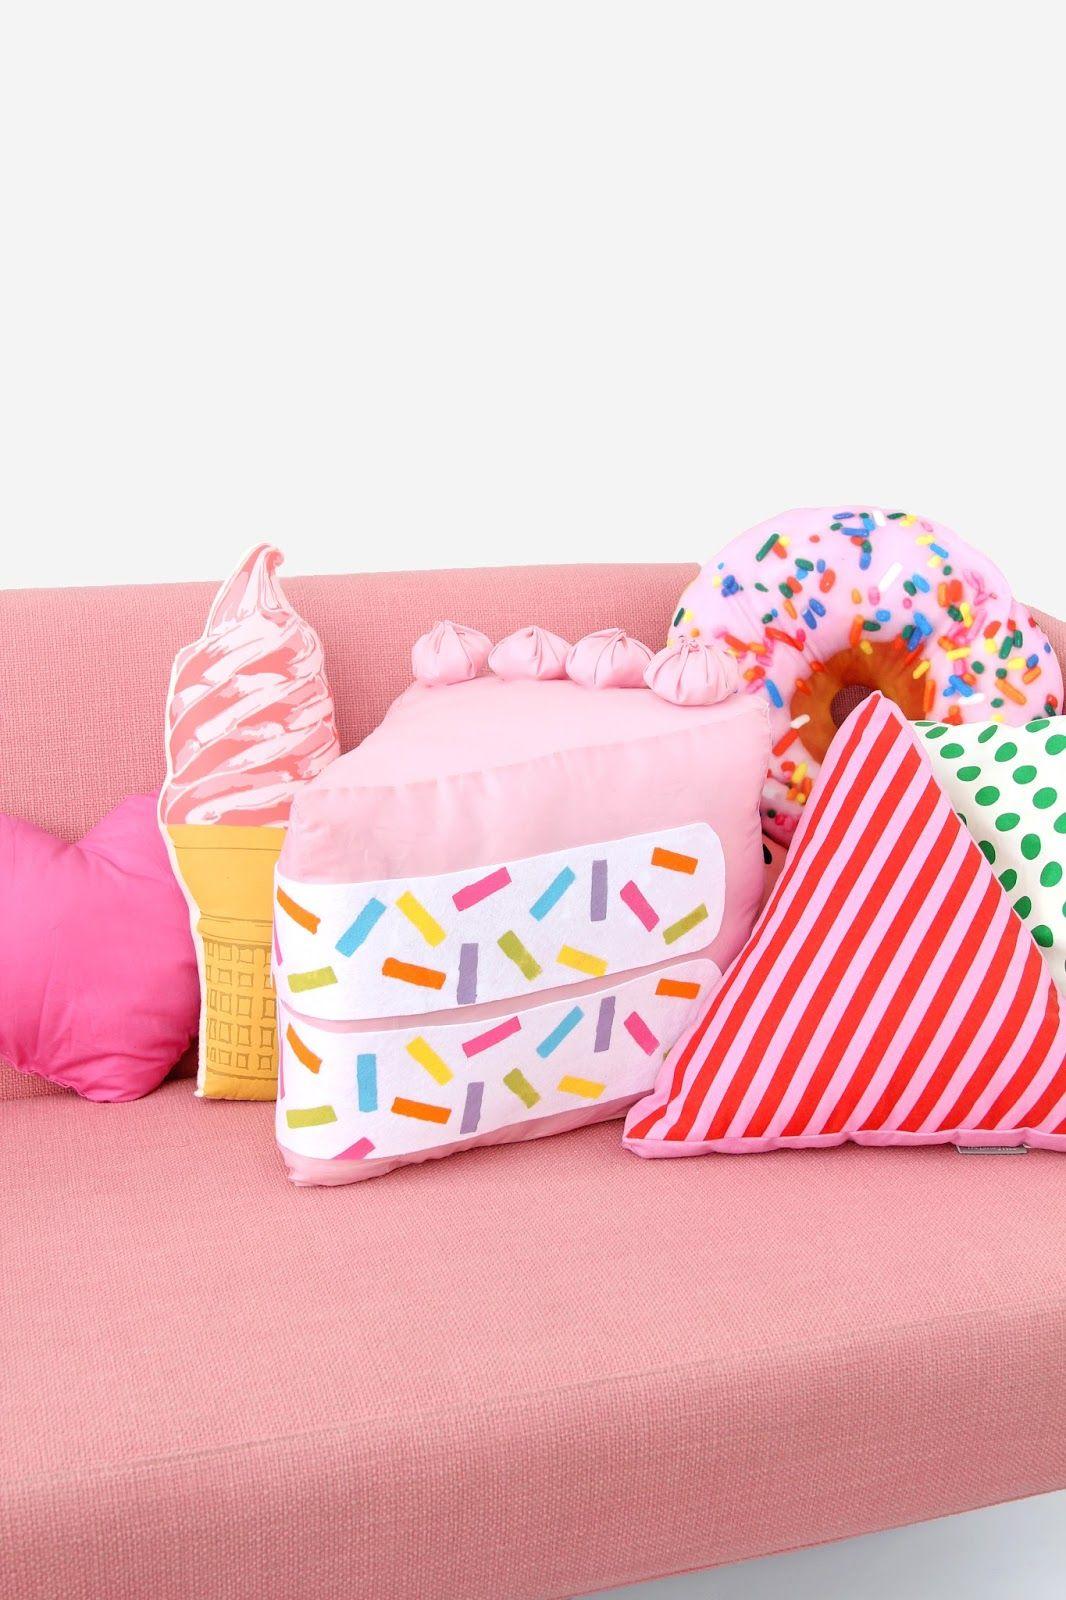 Diy Food Pillows No Sew: DIY No Sew Funfetti Cake Slice Pillow   DIY  Duh!   Pinterest    ,